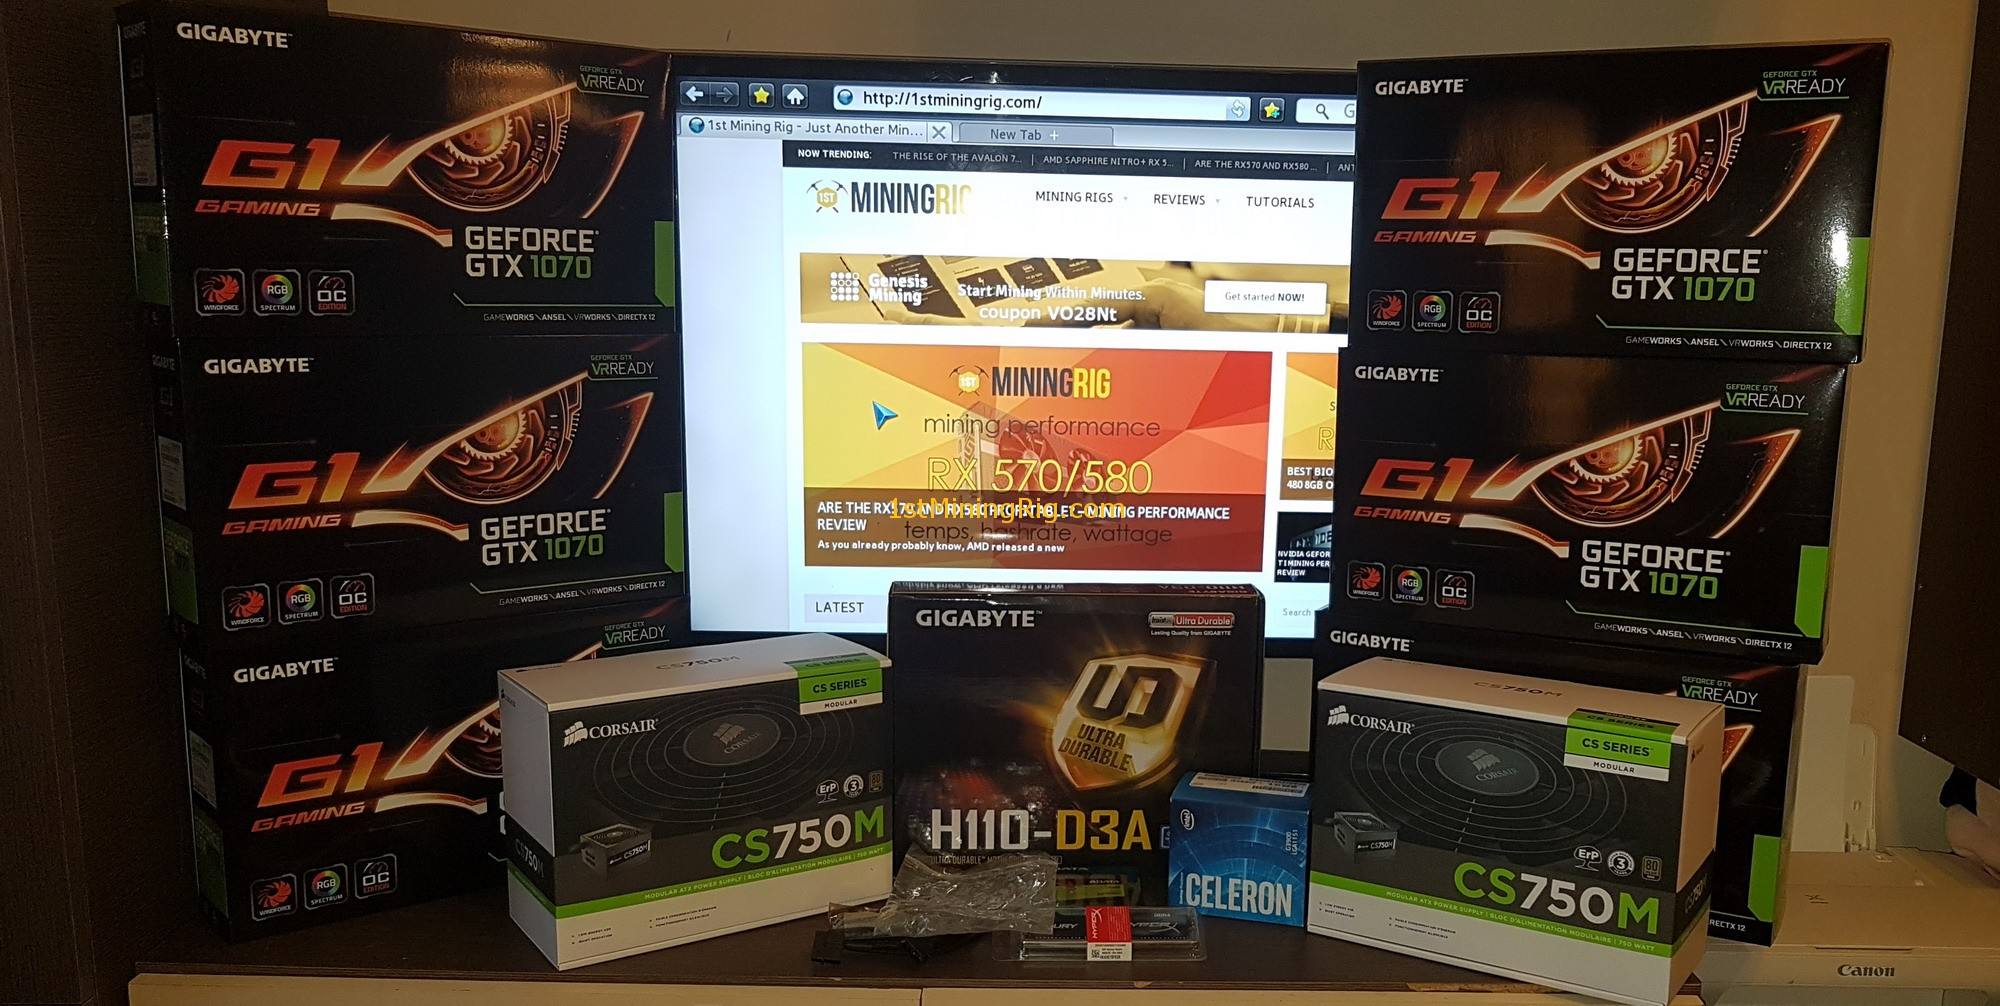 Nvidia Gigabyte GeForce GTX 1070 G1 Gaming Mining Rig Tutorial - 1st